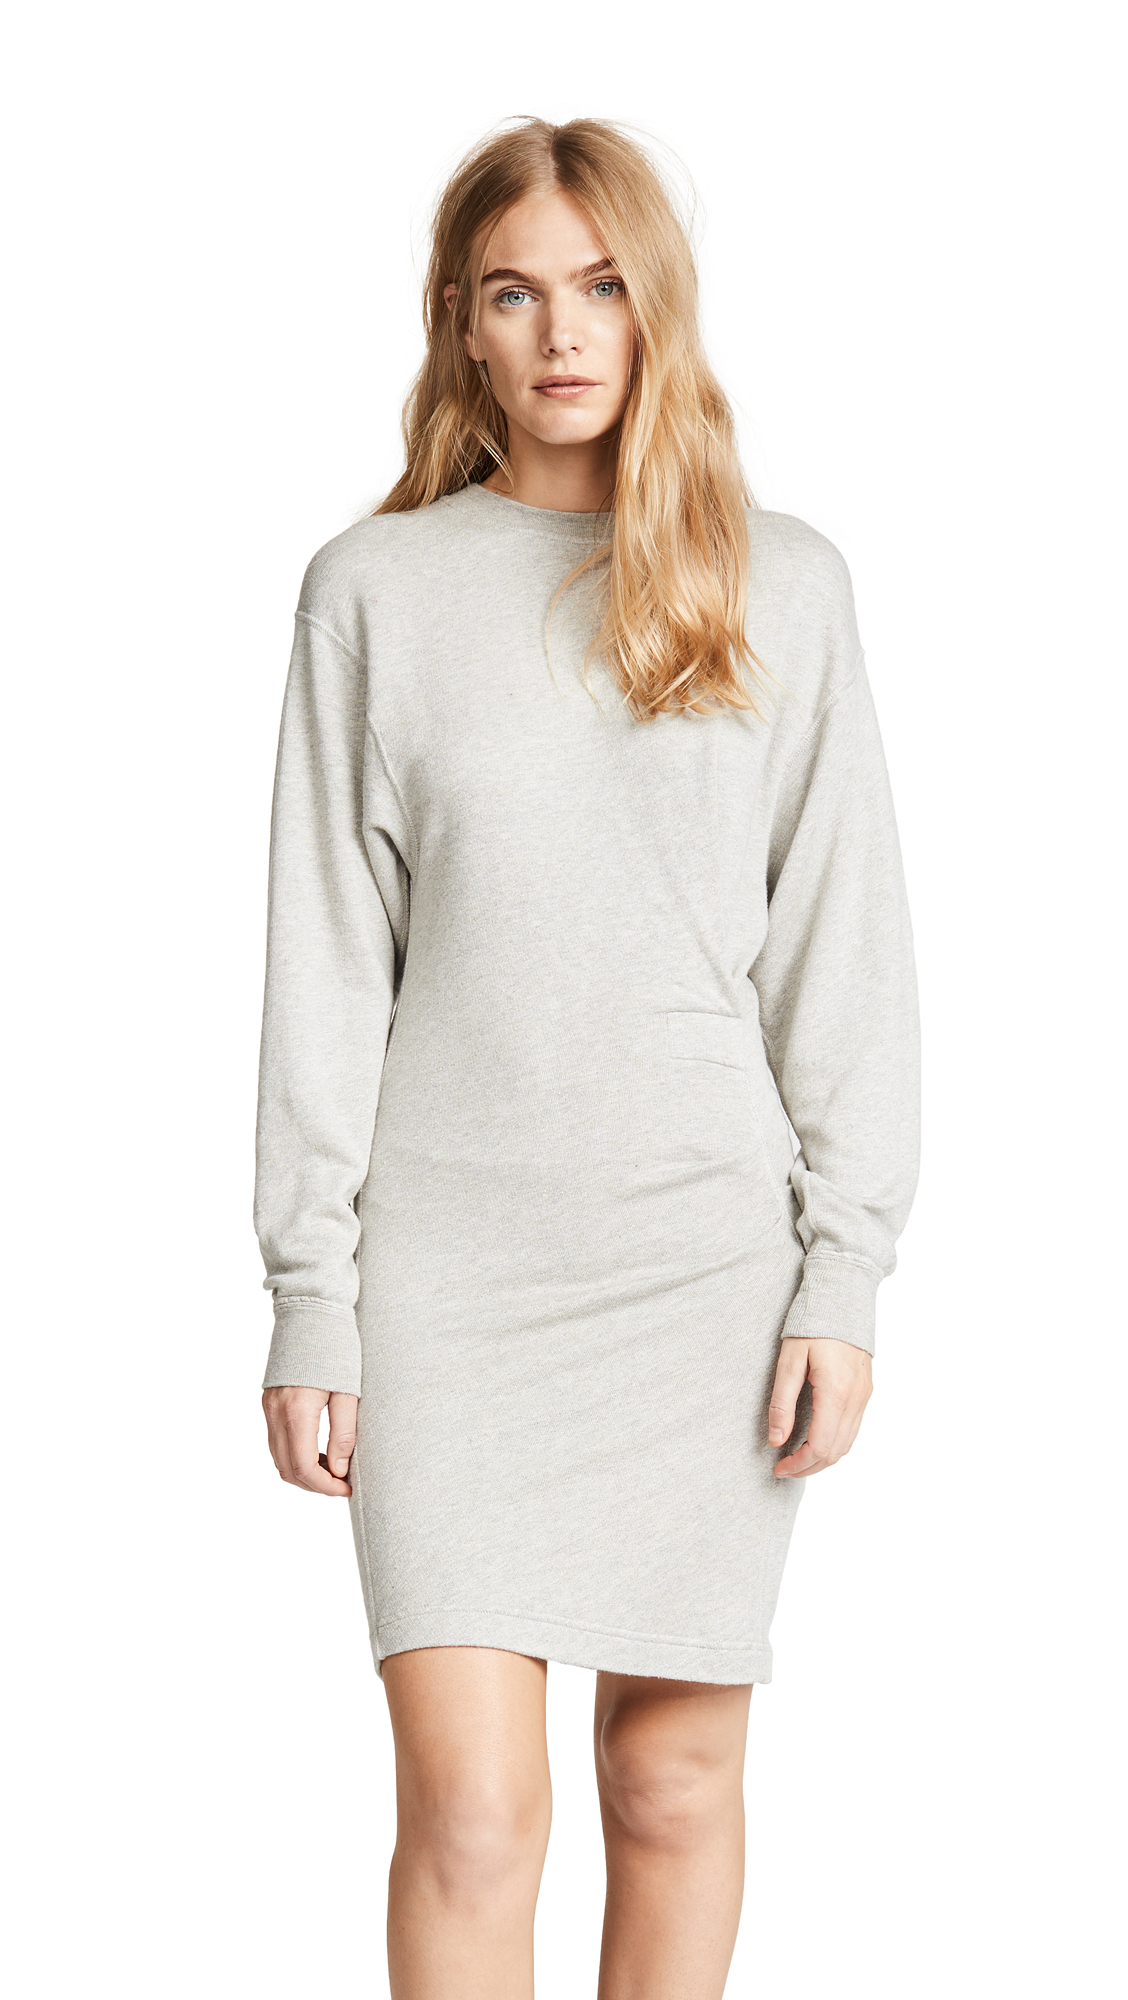 Isabel Marant Etoile Fewlyn Dress